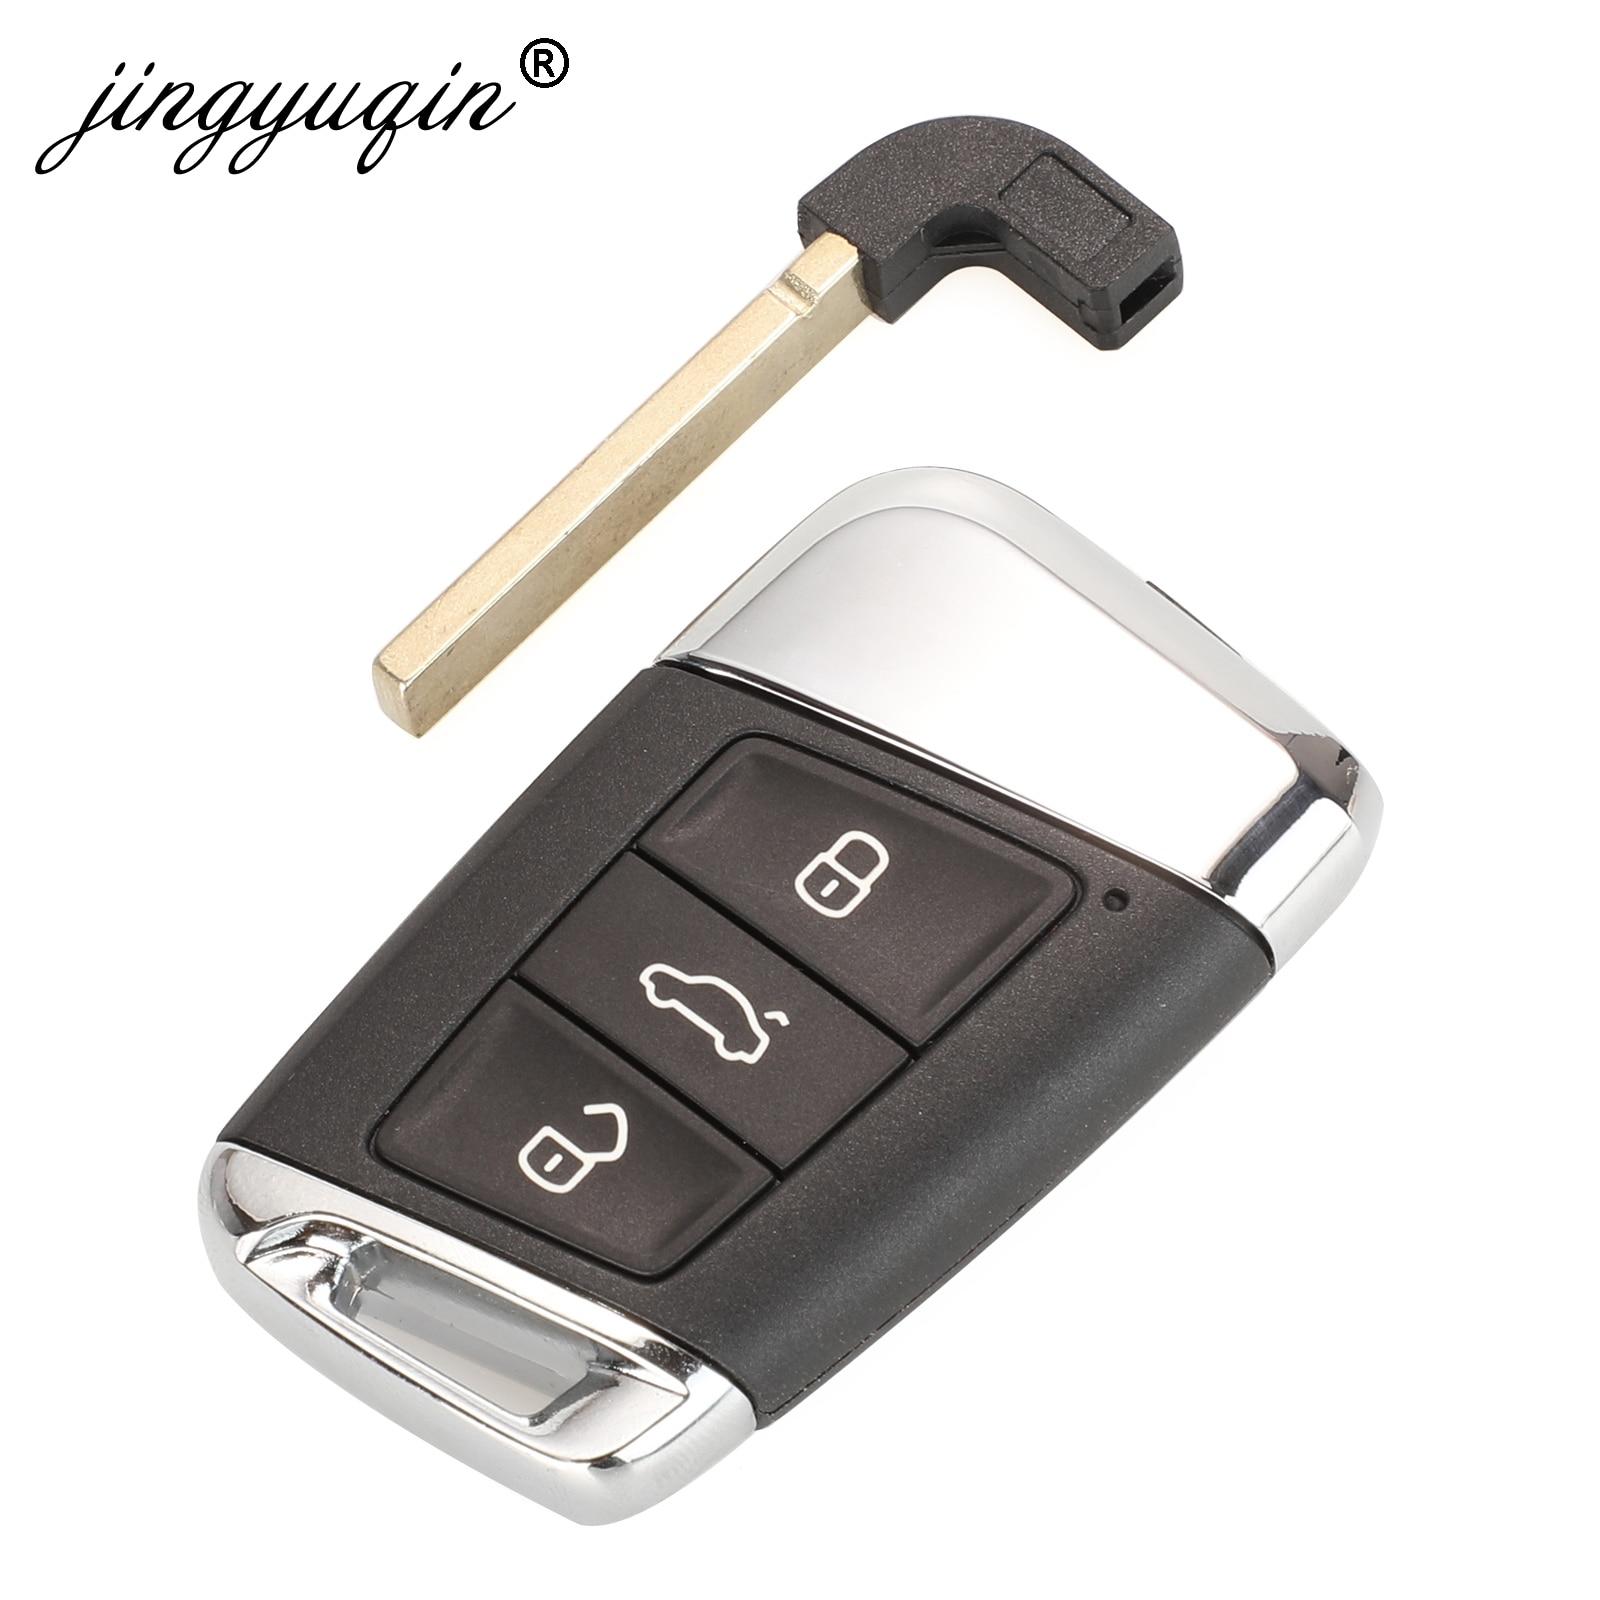 Jingyuqin 10 Uds 3 botón inteligente de la llave del coche caso de Shell para VW Passat B8 nuevo Magotan B5 Skoda Superb A7 variante Golf + Insertar hoja